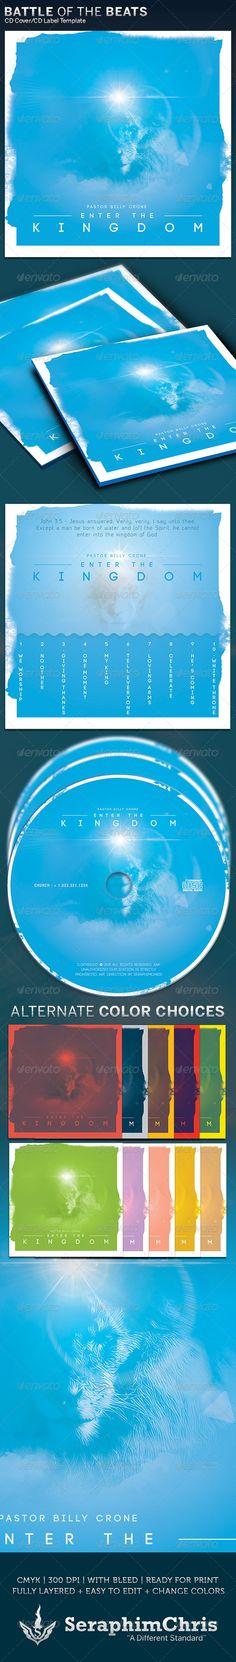 Enter the Kingdom CD Cover Artwork Template